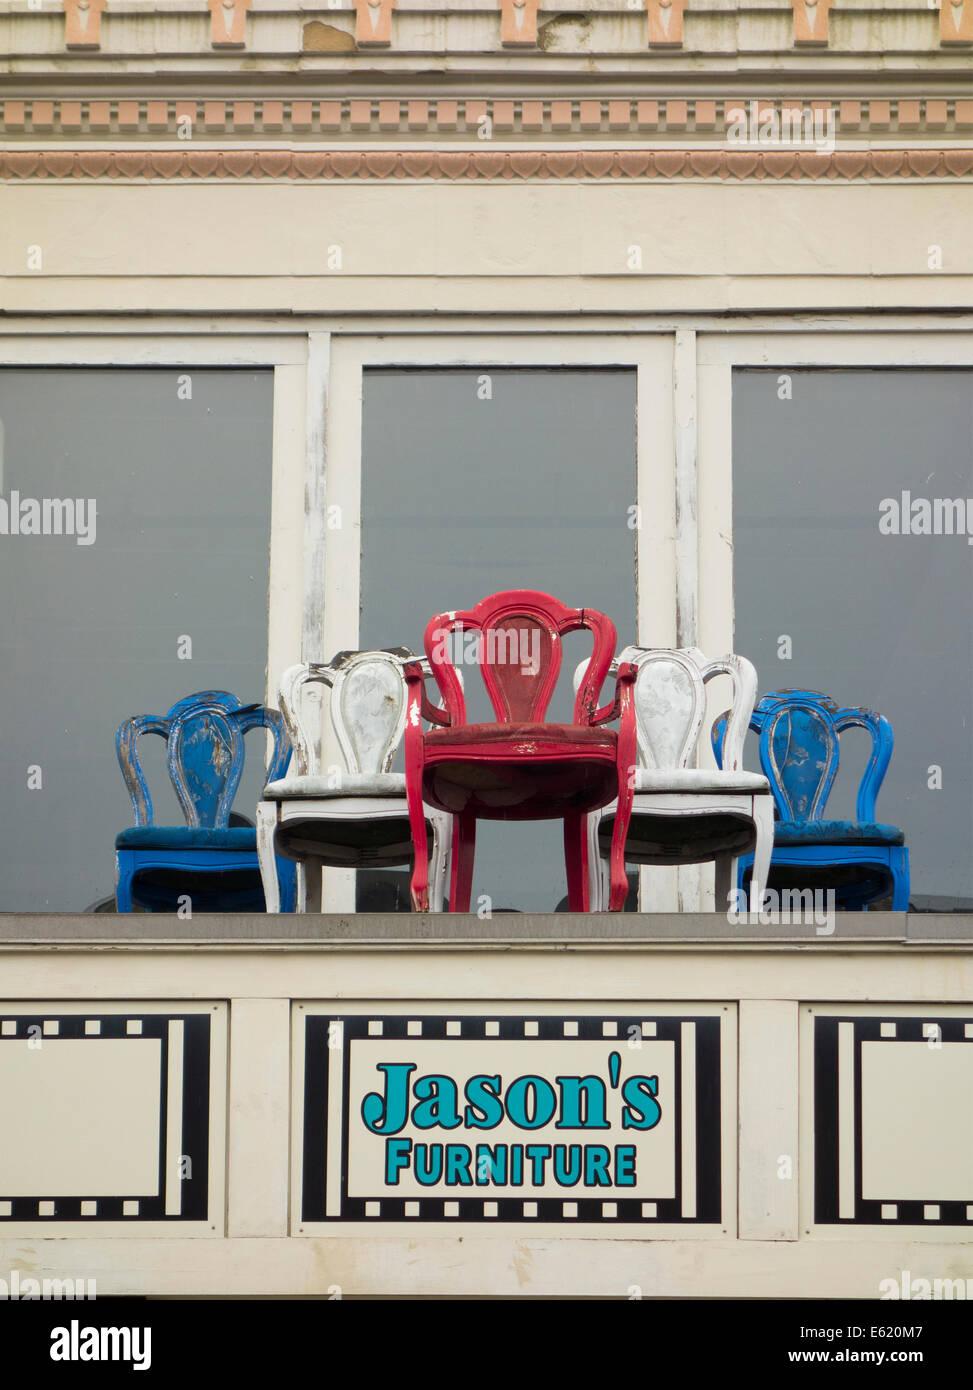 Jasonu0027s Furniture Store In New London CT   Stock Image